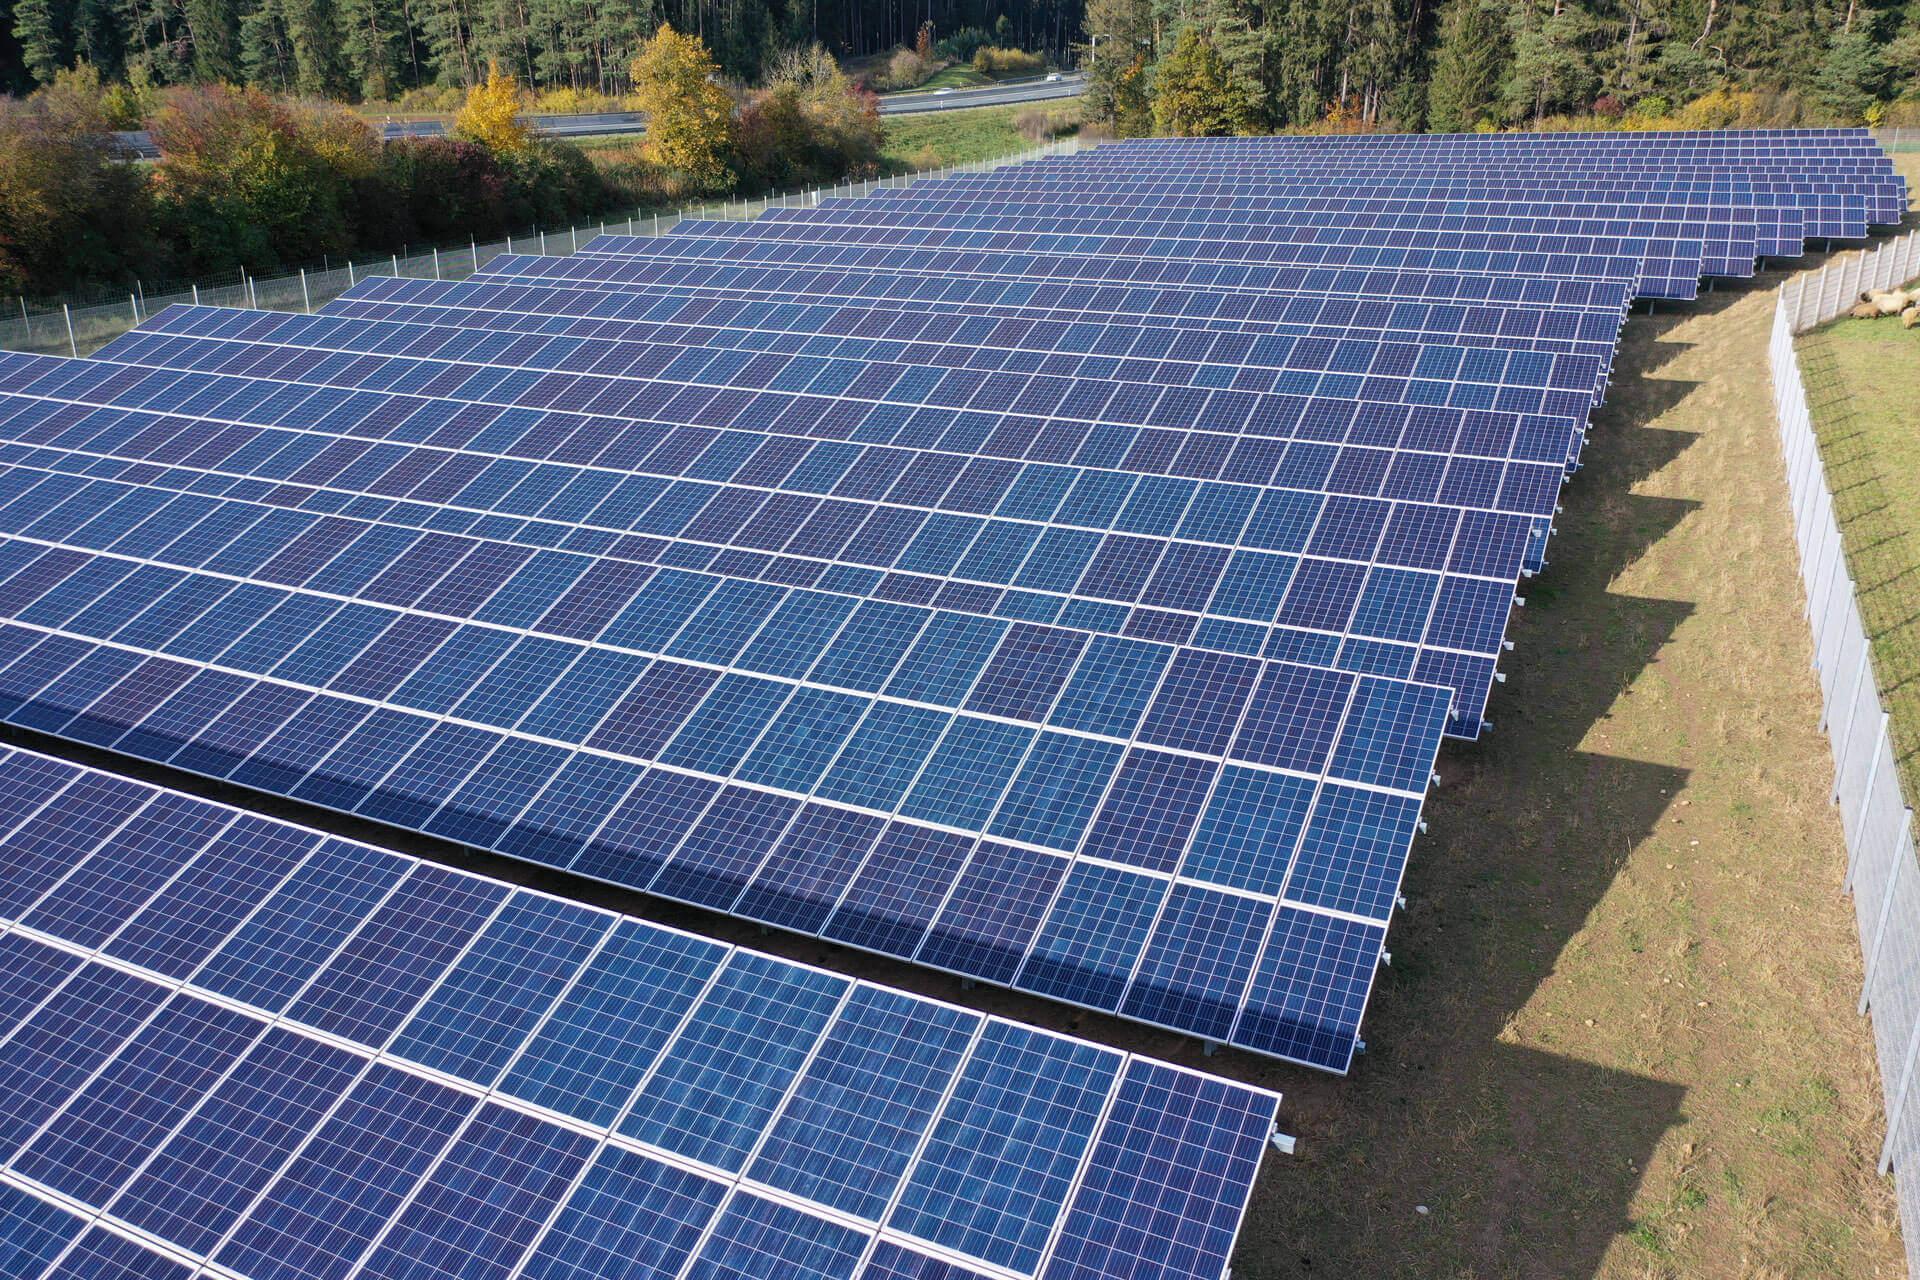 Solarpark Ottenhof